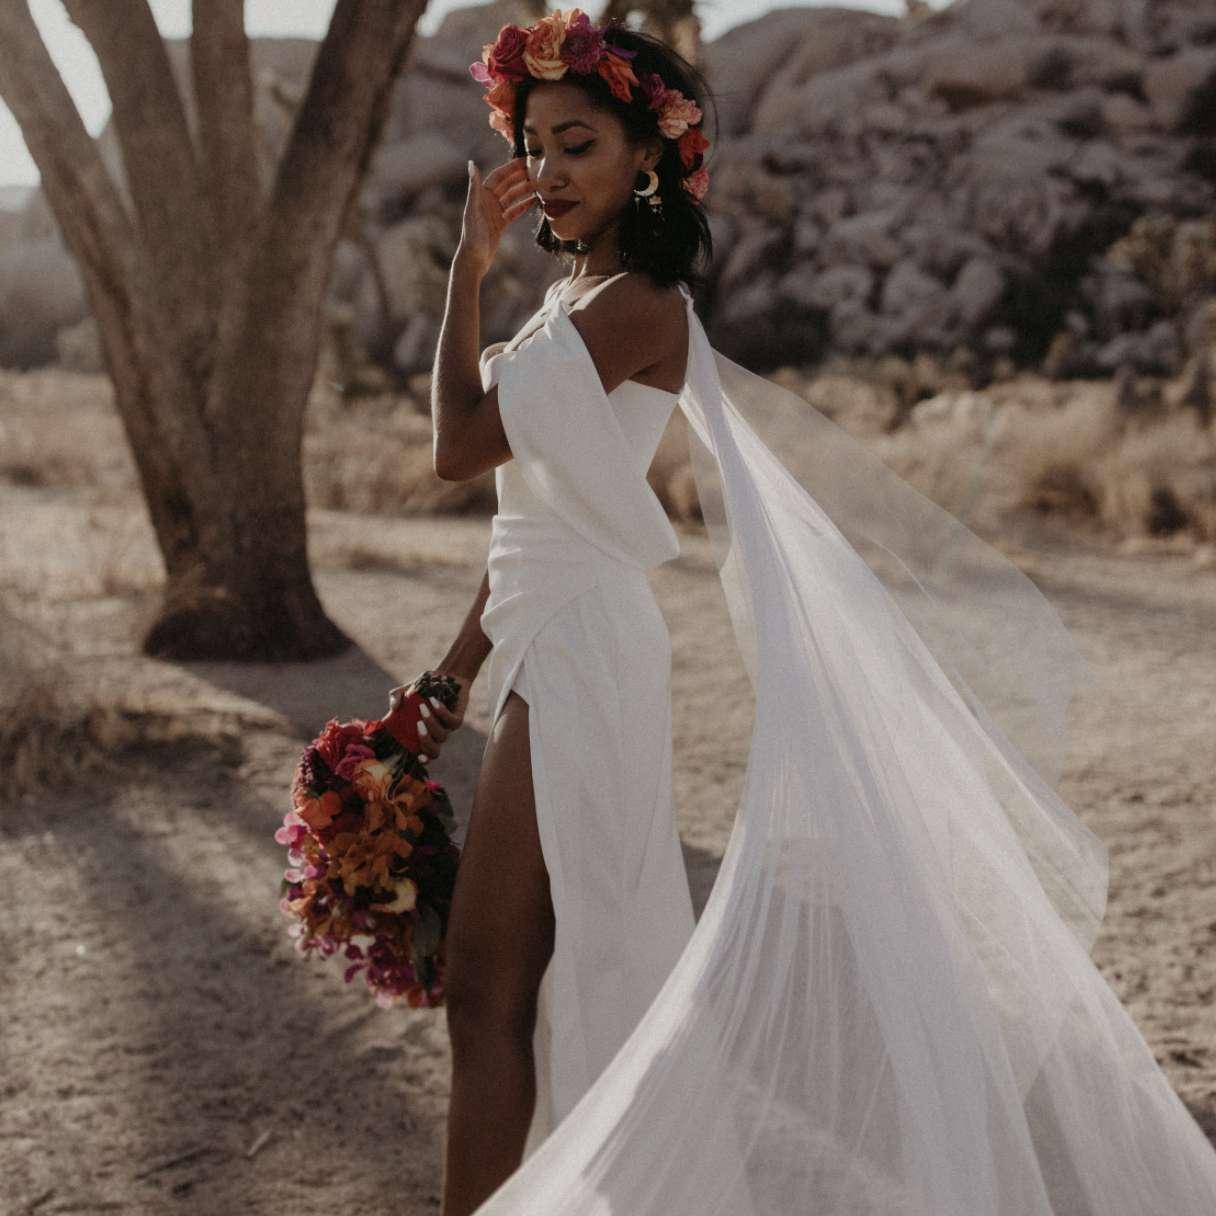 Bride with flower crown in desert